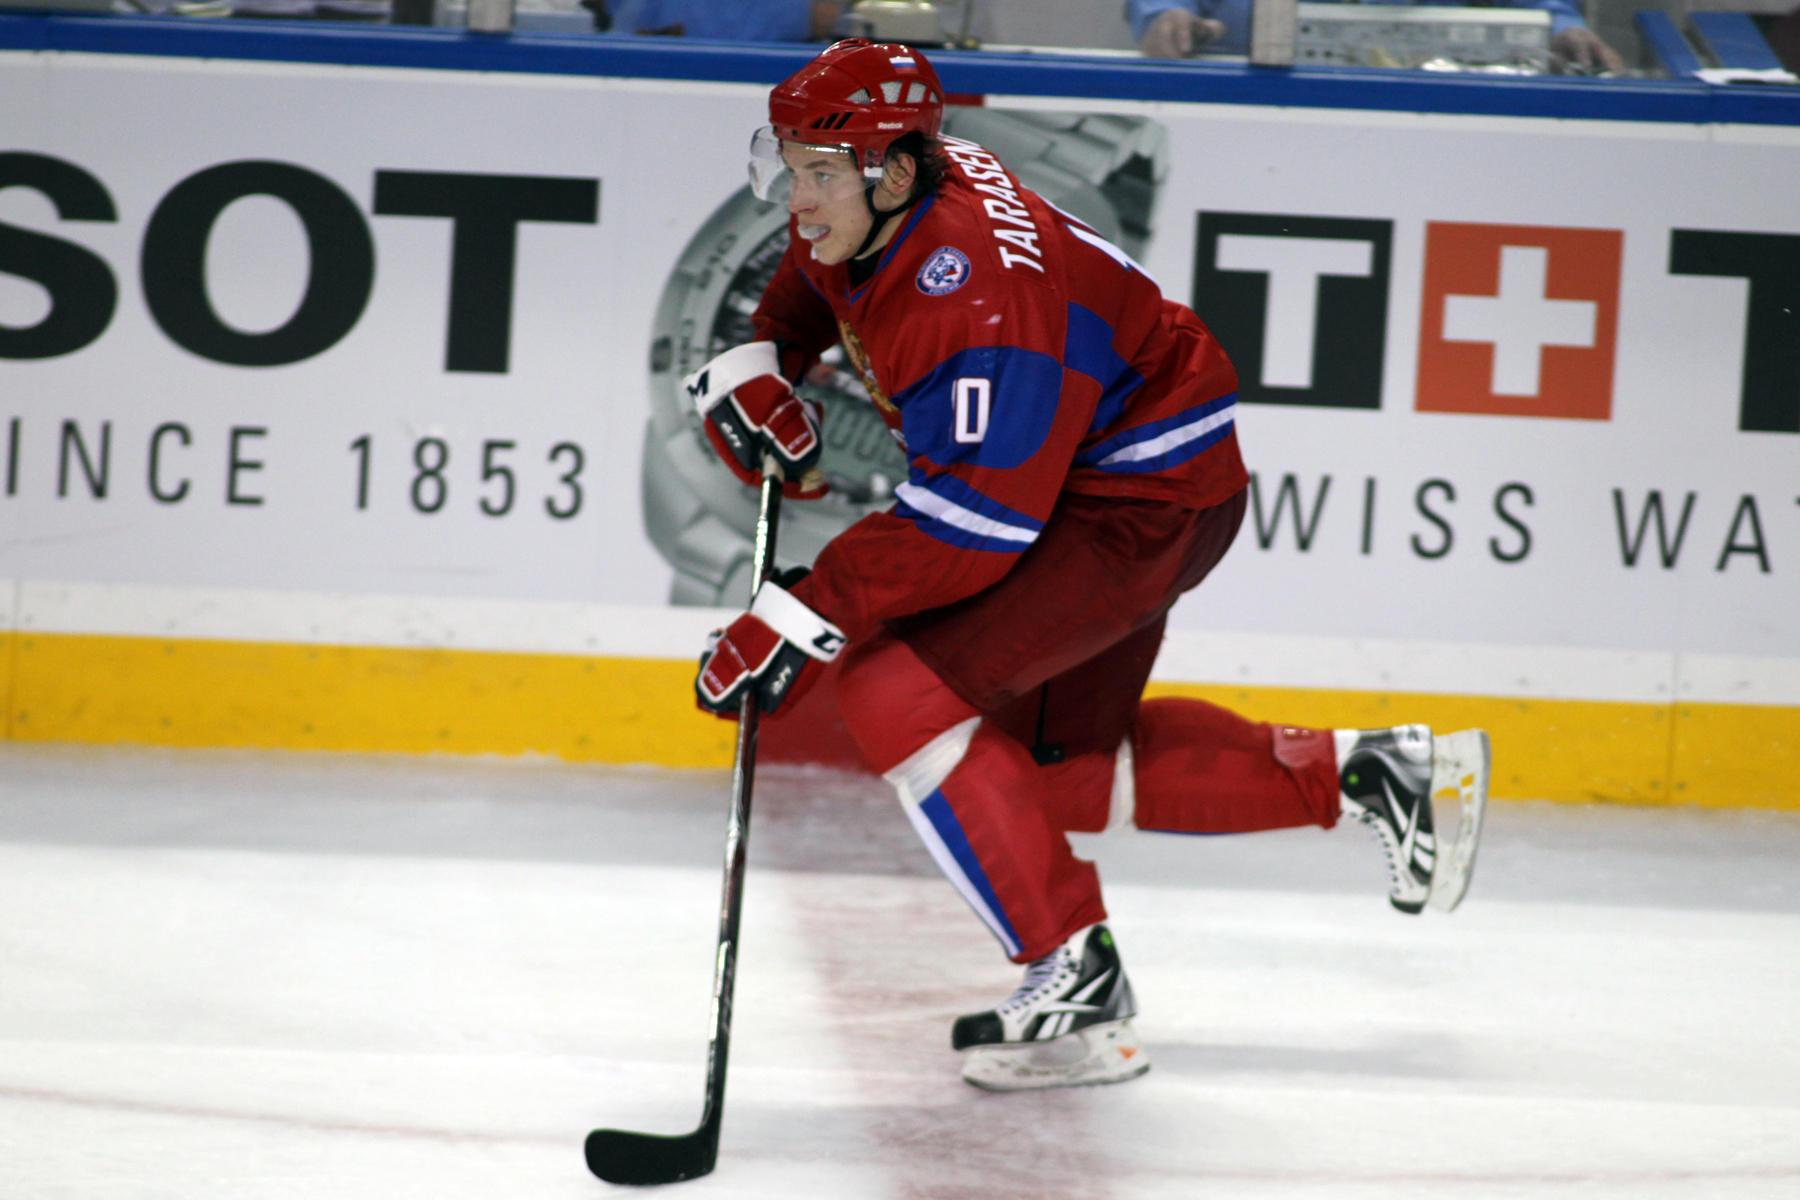 World Junior Ice Hockey Championships 2022